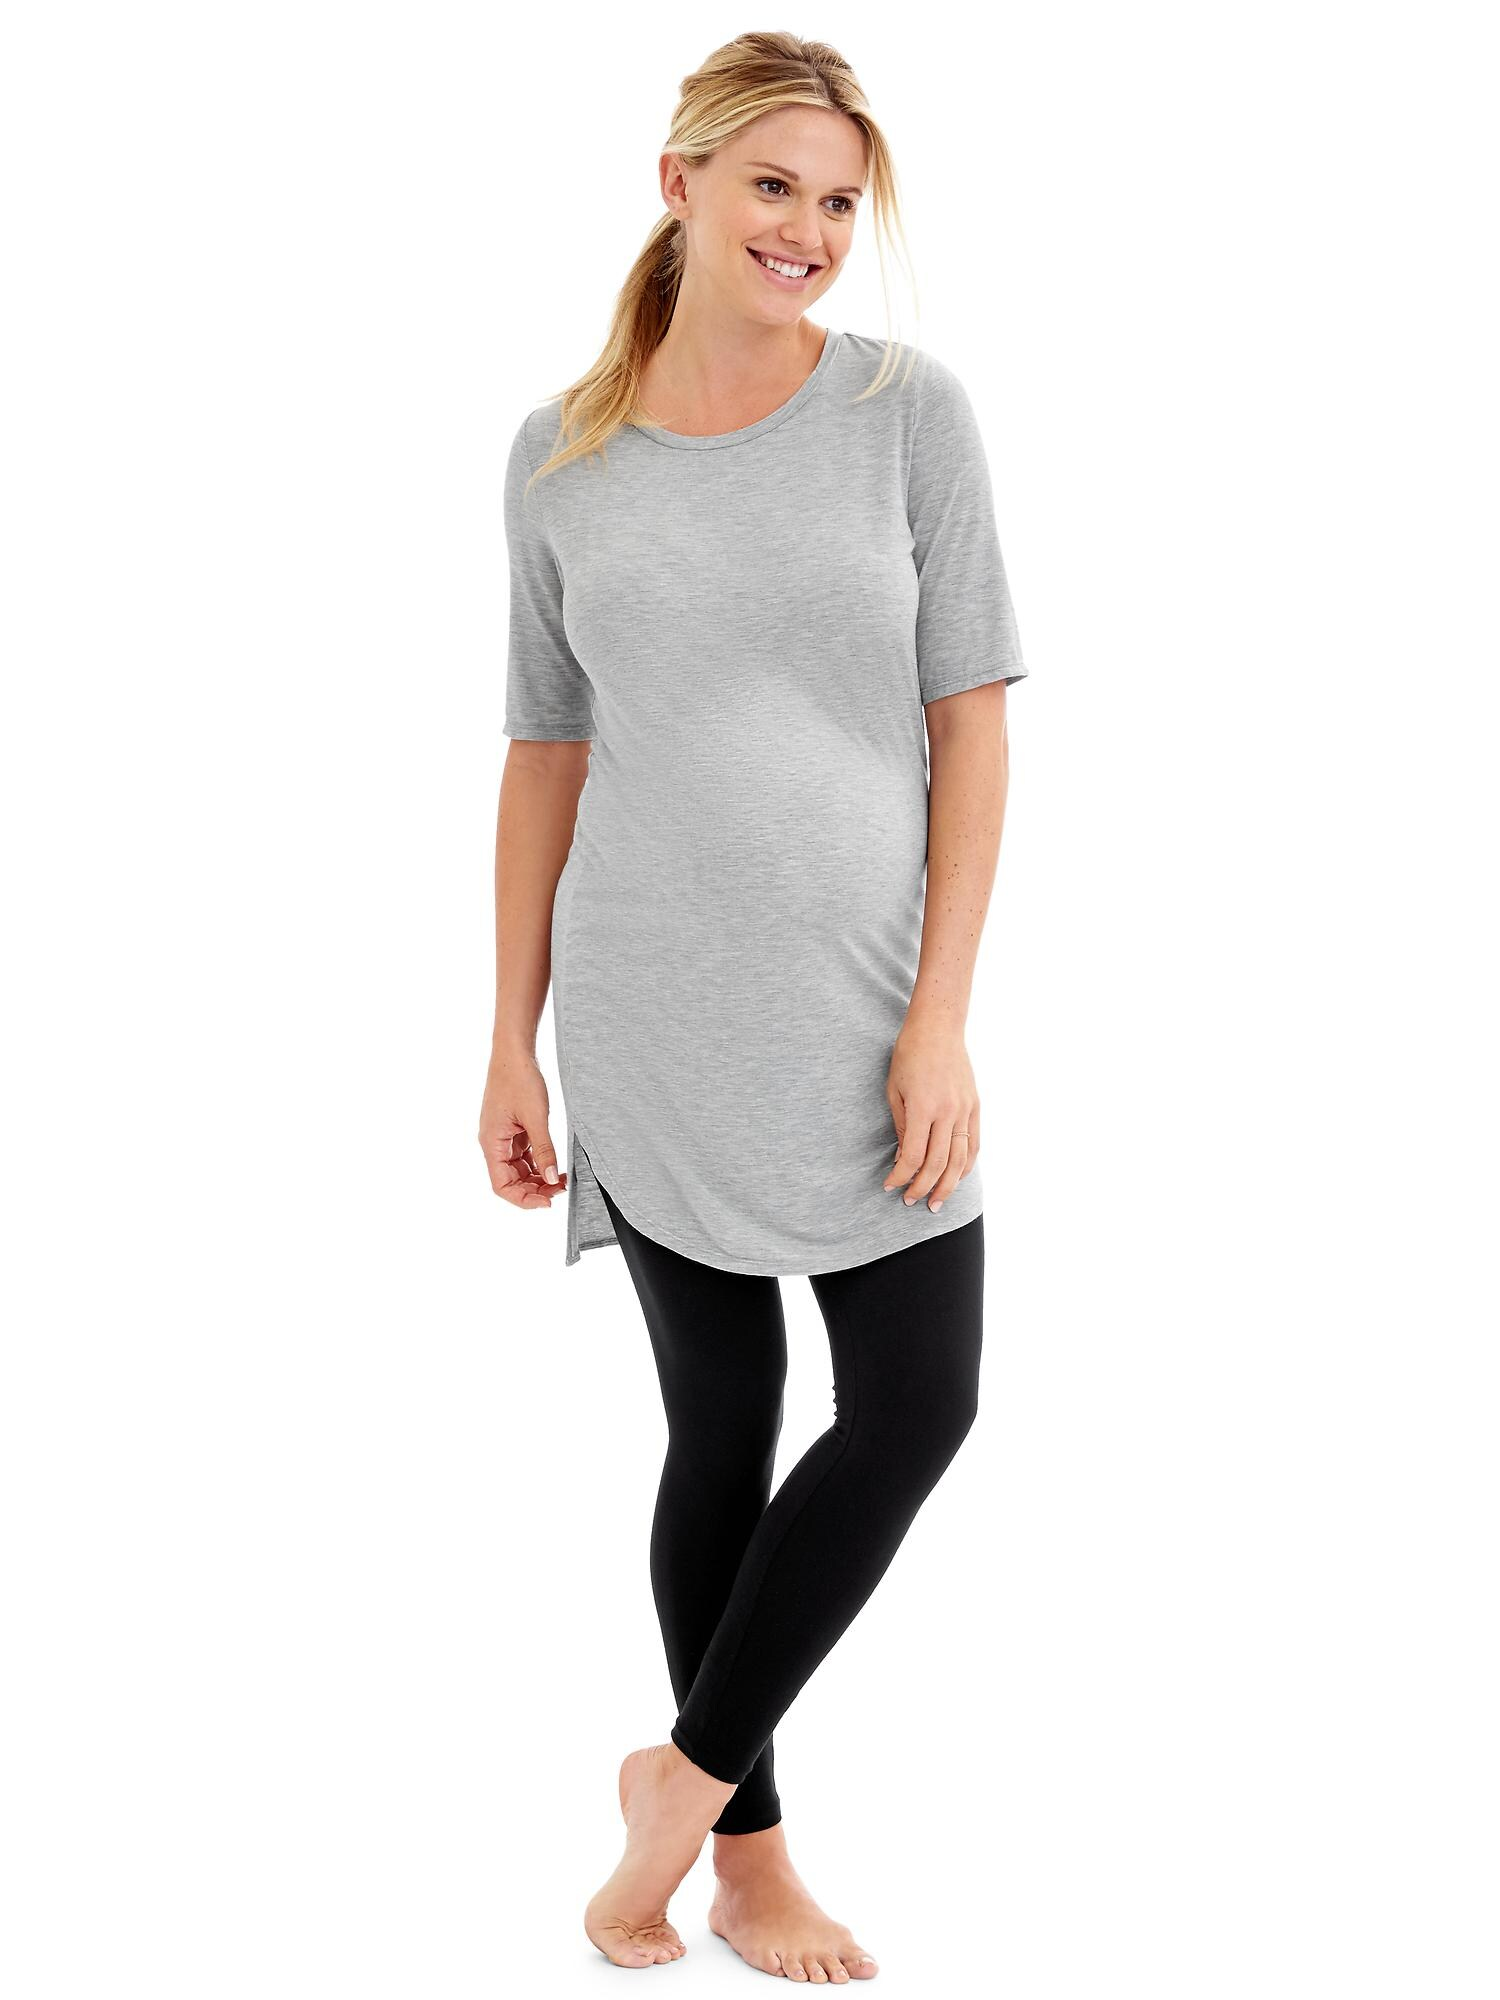 935fb7b8d0319 Maternity Sleep T-Shirt in Modal